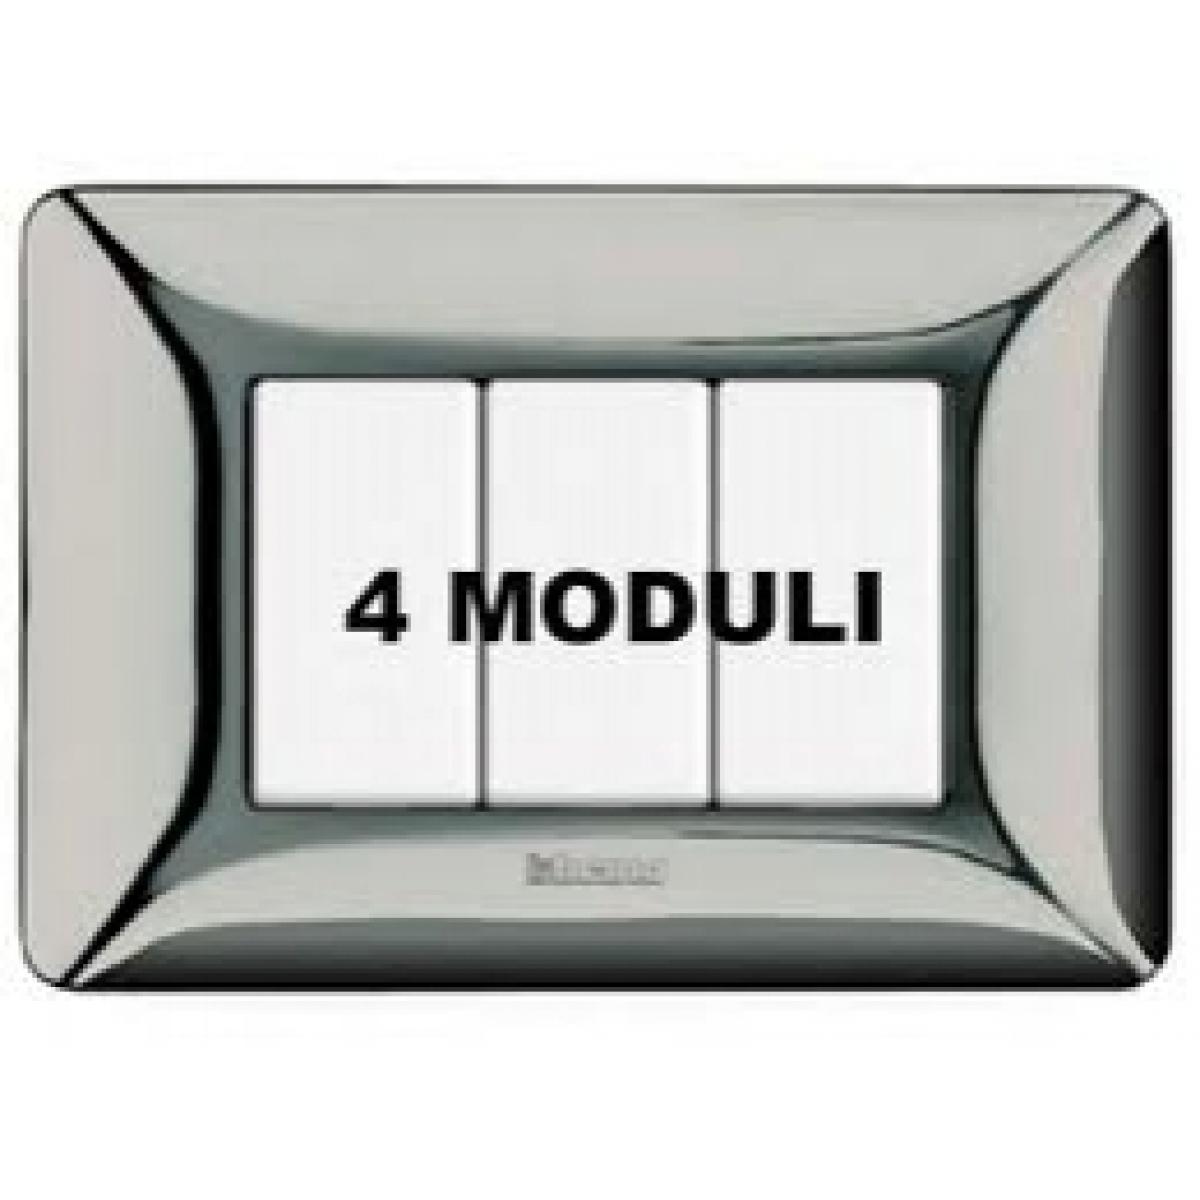 Placca 4 Moduli Cromo Lucido Bticino Matix AM4804GCR